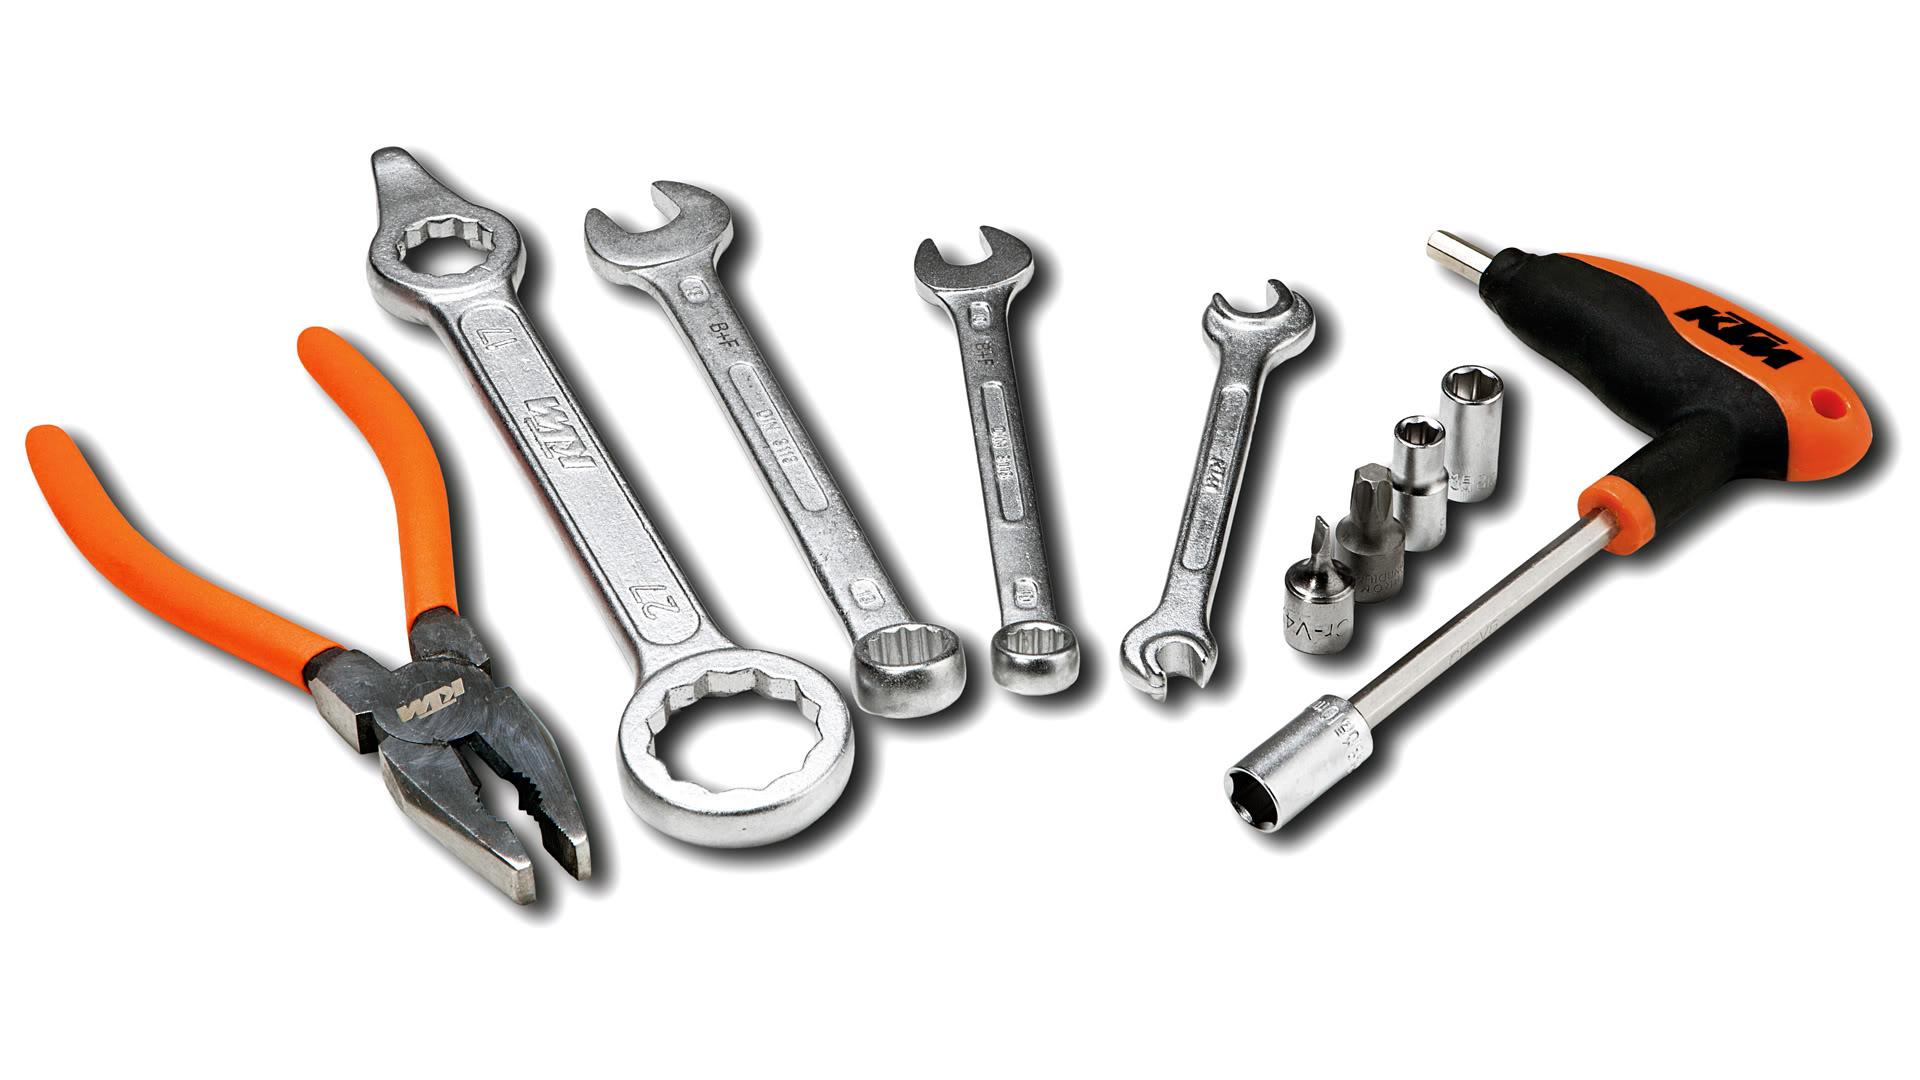 tool - photo #17